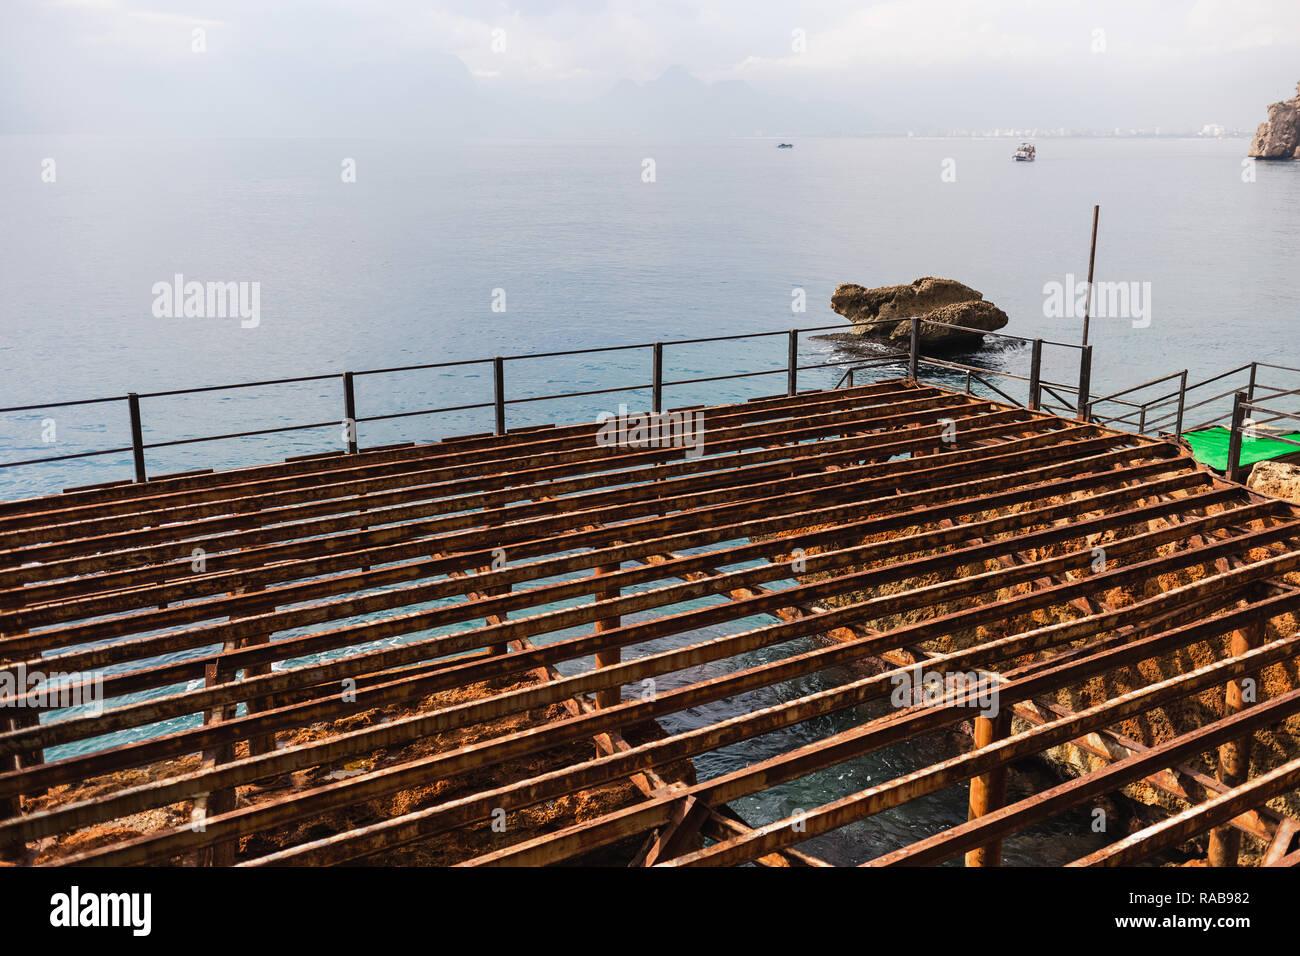 Finish of summer beach holidays season concept. Disassembled wooden pontoon at seashore. Preparations to winter cold season. Horizontal color photogra - Stock Image